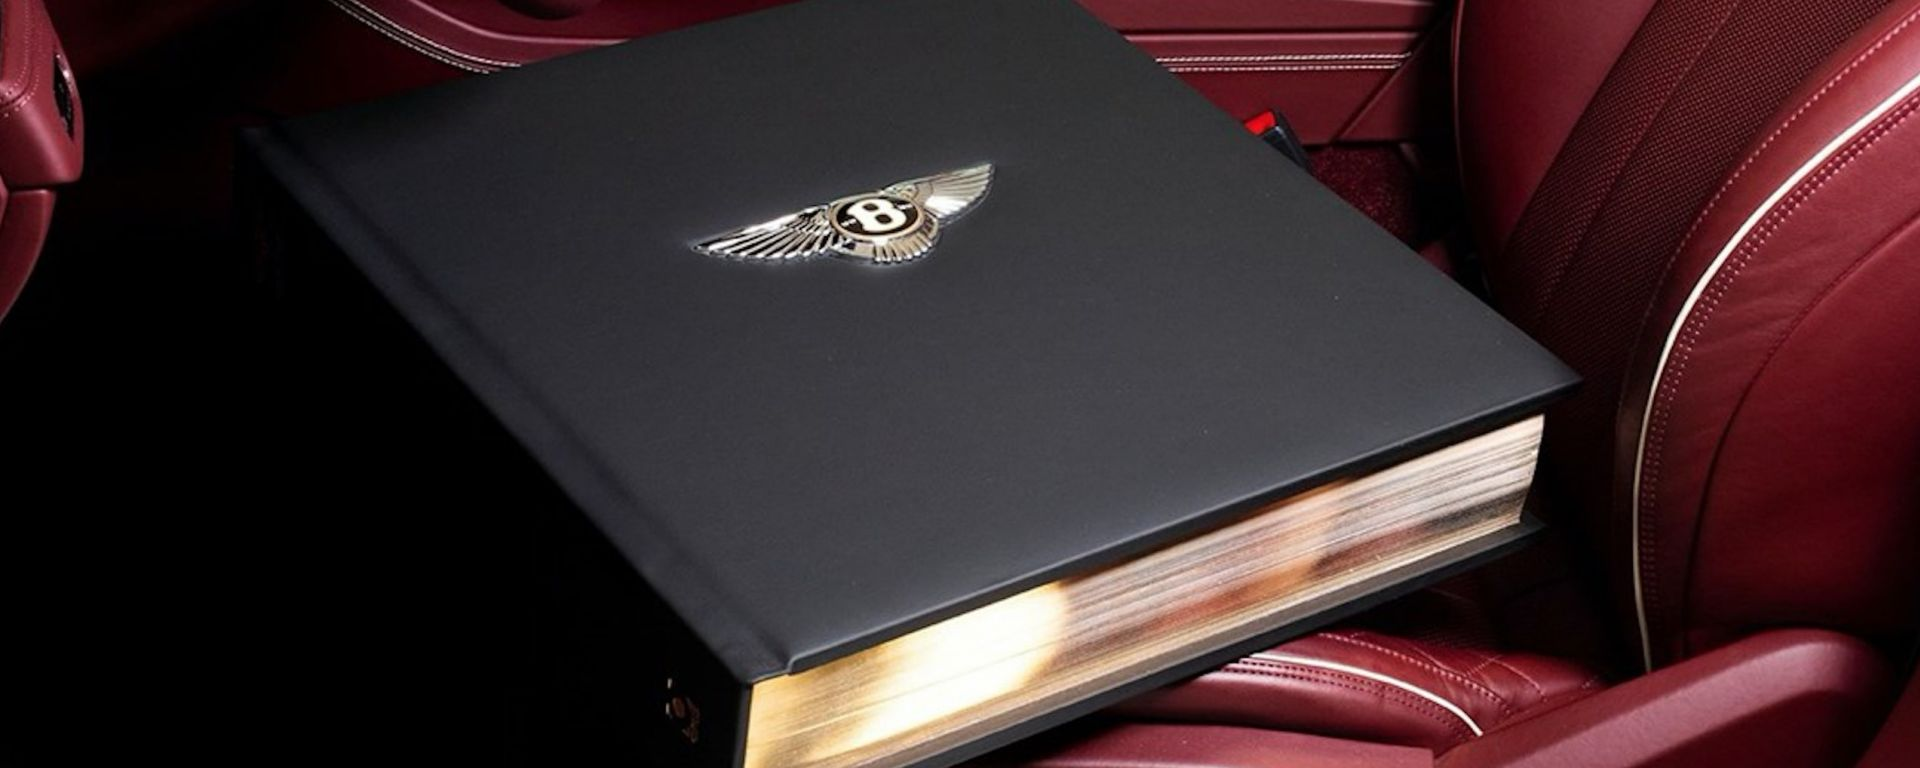 Bentley, il centenario: in arrivo un libro da 230mila euro